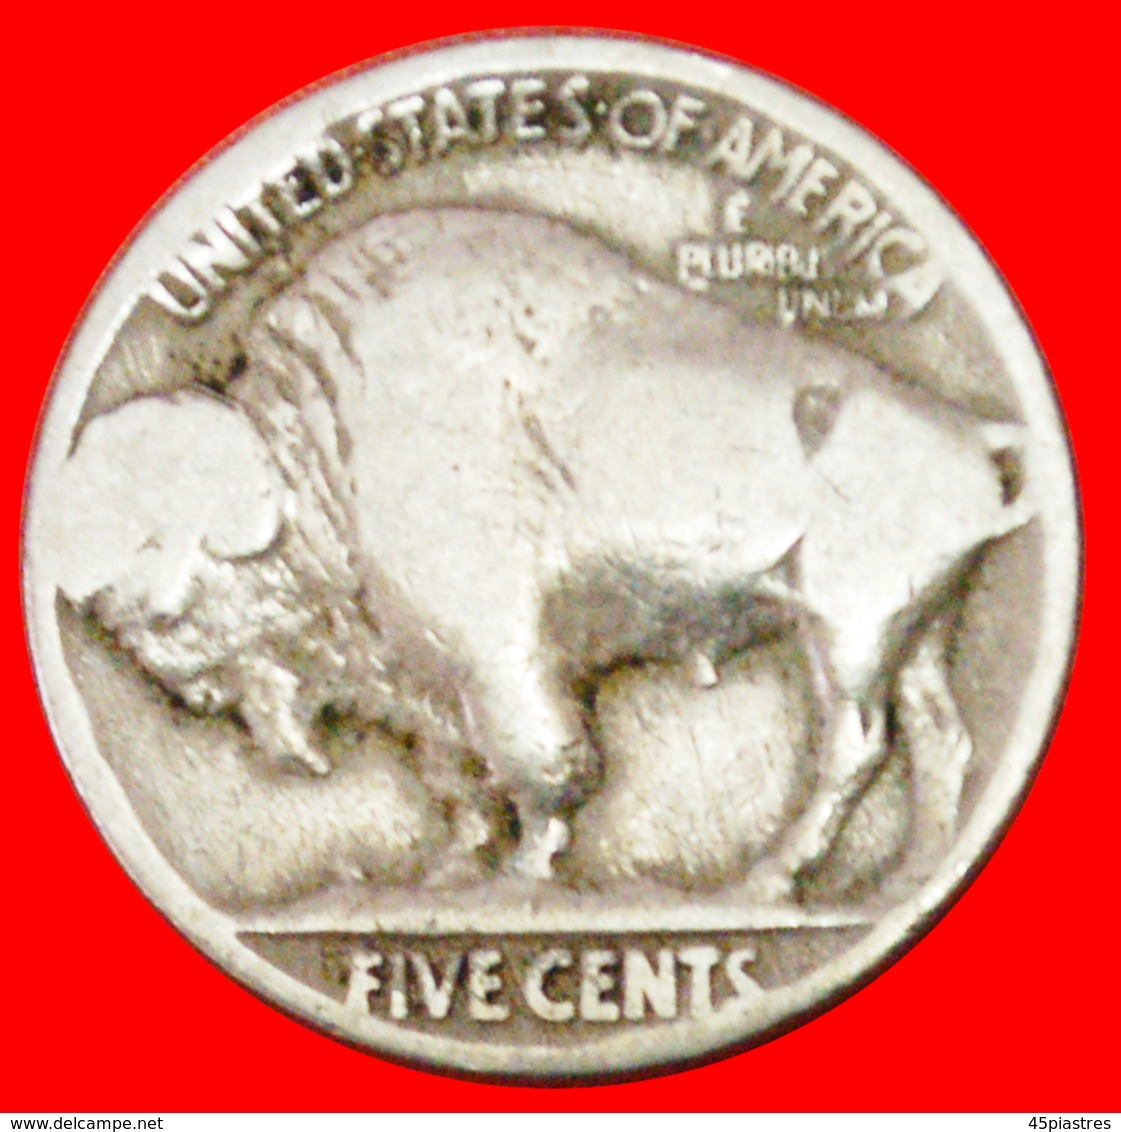 # INDIAN HEAD (1913-1938): USA ★ 5 CENTS 1926 BLACK DIAMOND (1893-1915)! LOW START ★ NO RESERVE! - Emissioni Federali